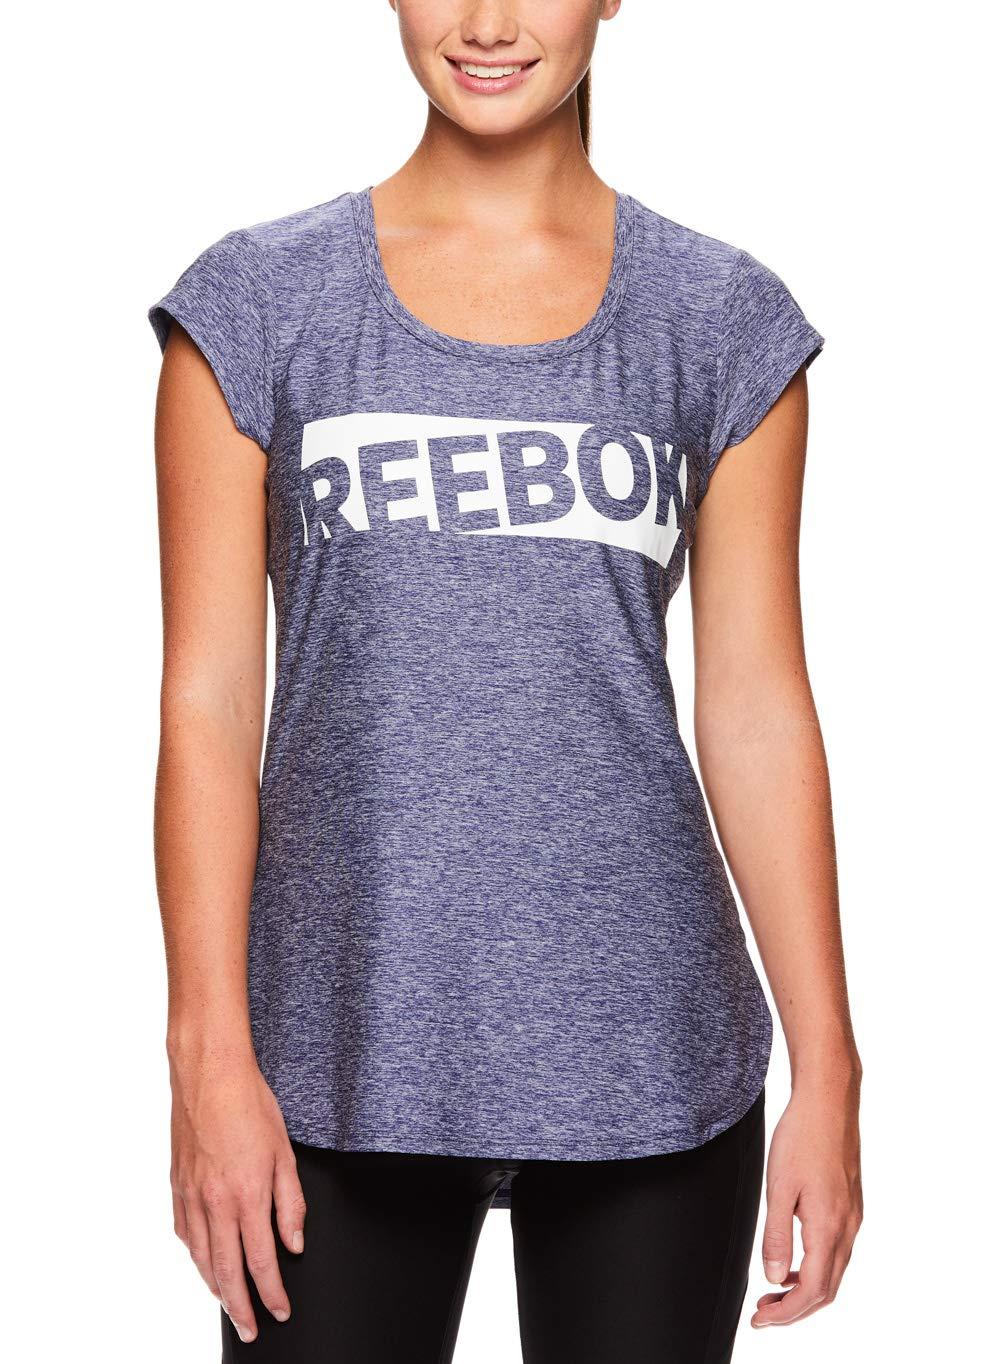 Reebok Women's Legend Performance Top Short Sleeve T-Shirt - Medieval Blue Heather, Extra Small by Reebok (Image #1)